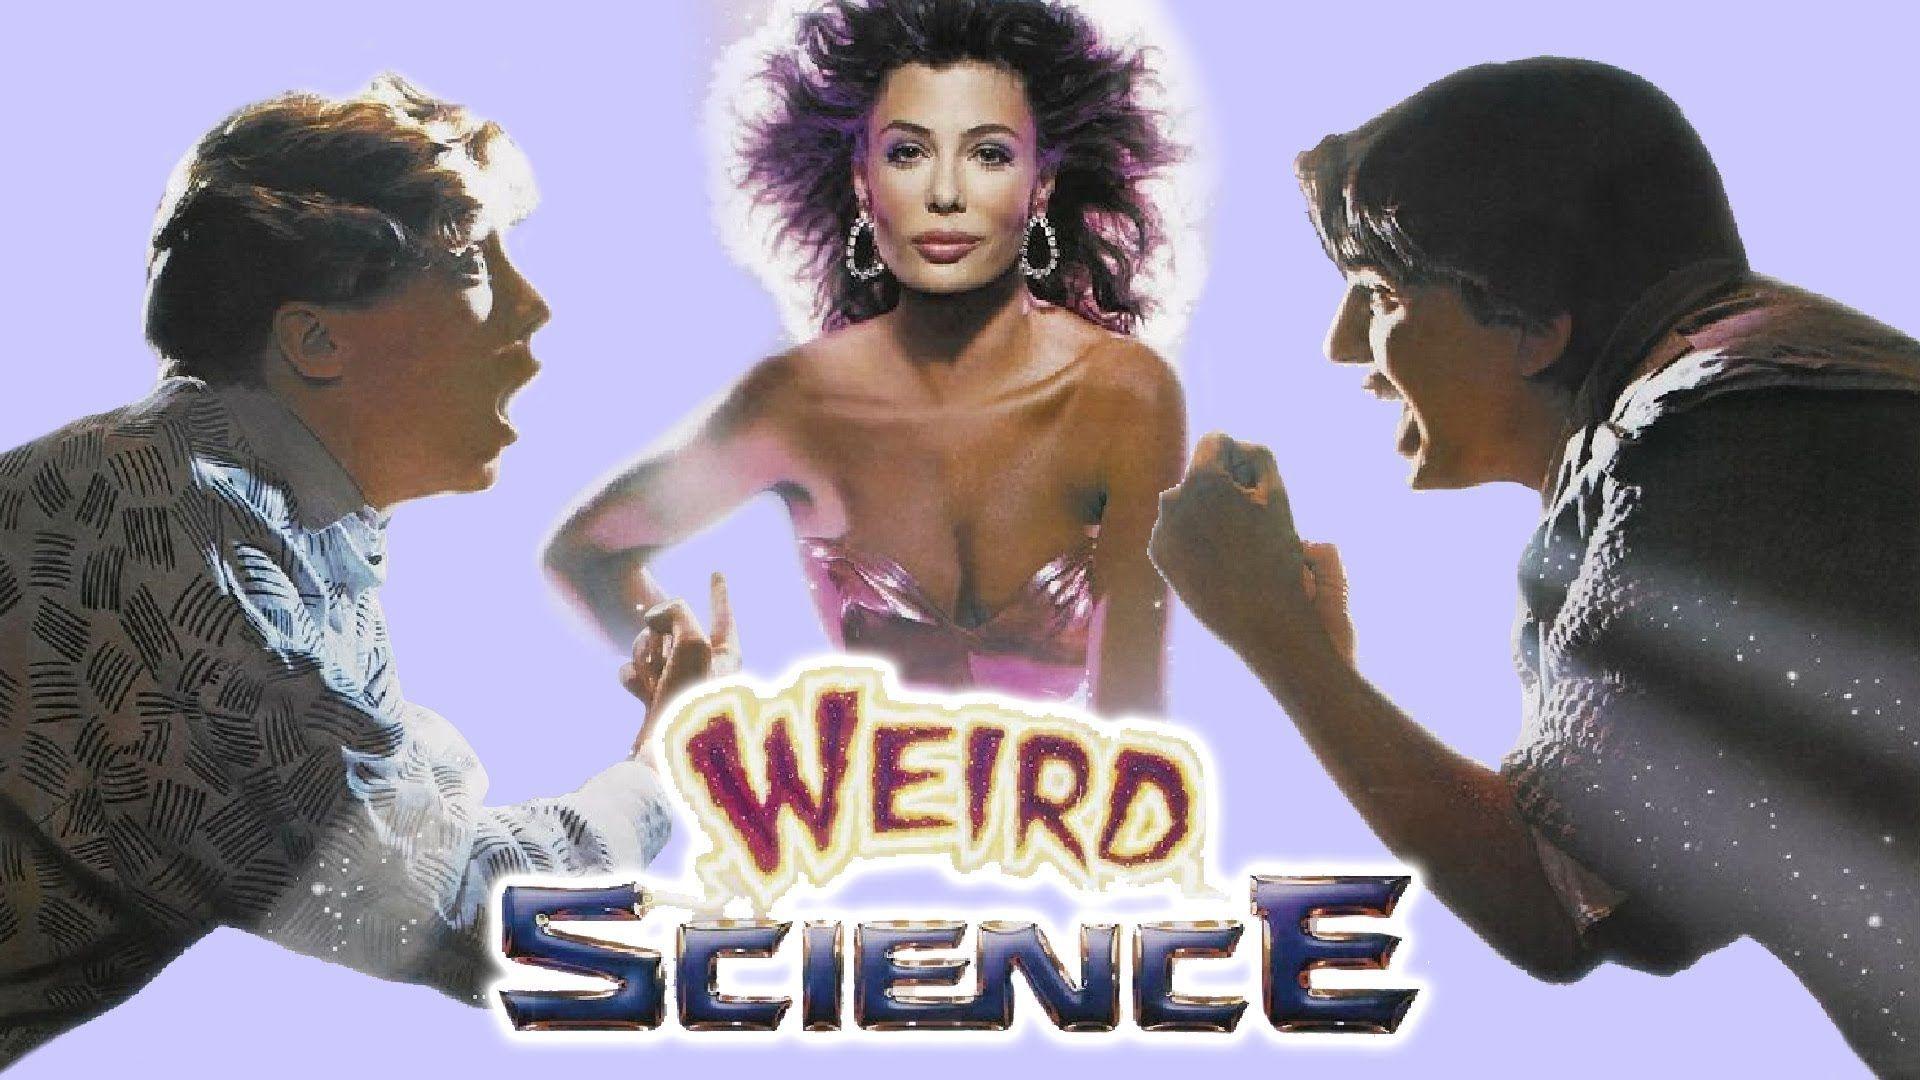 Weird Science (1985) Stars Anthony Michael Hall, Ilan